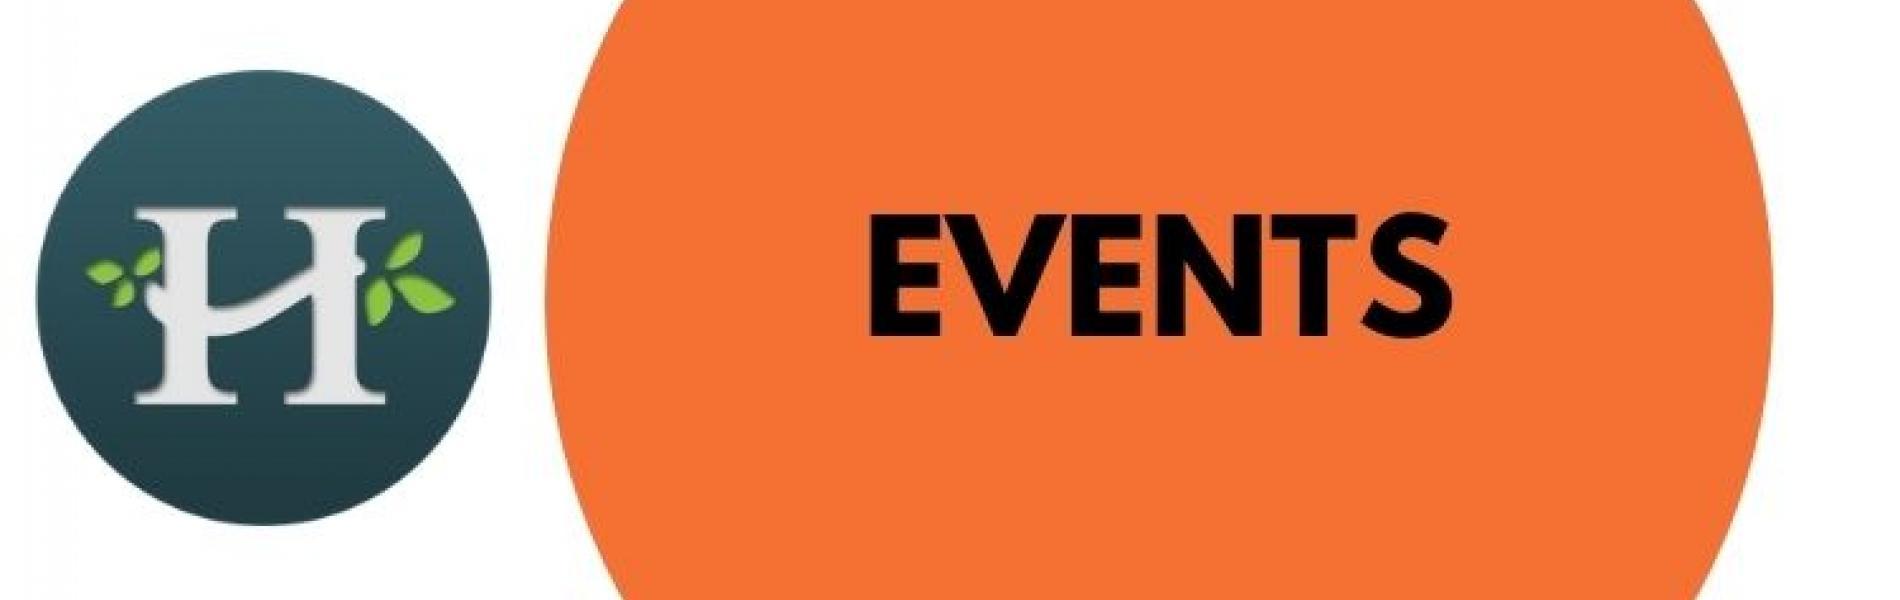 events team logo